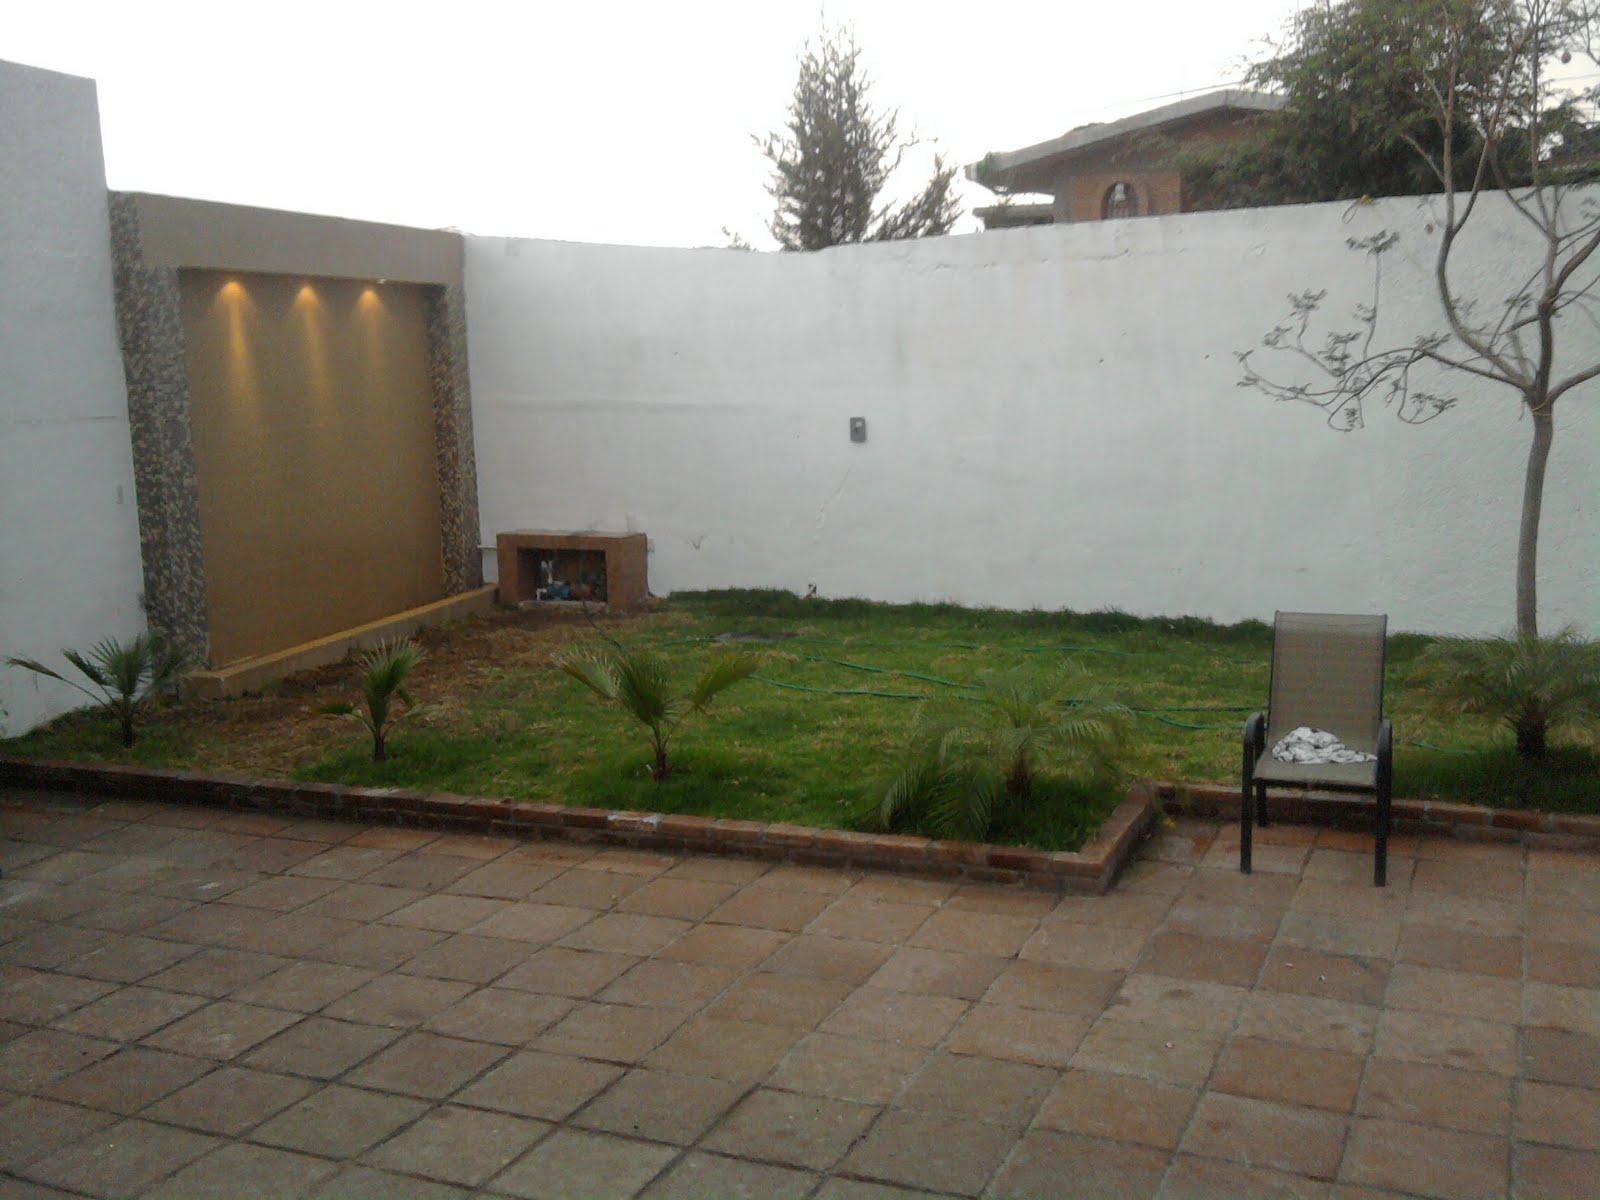 Muros llorones para jardin imagui - Muros de jardin ...